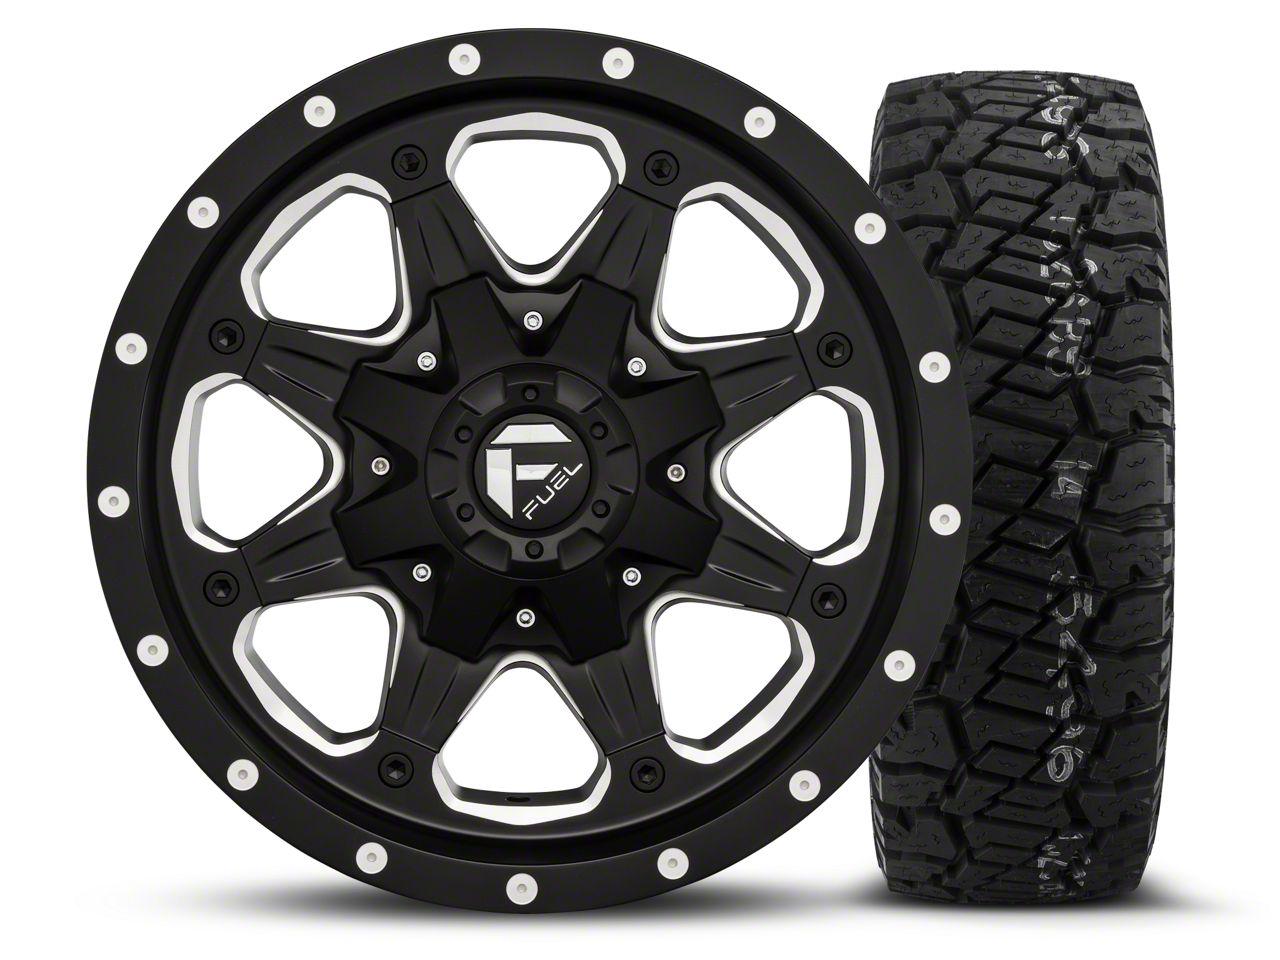 Fuel Wheels Boost - Black/Milled 16x8 Wheel - and Dick Cepek Fun Country Tire - 285/75R16 (07-18 Jeep Wrangler JK; 2018 Jeep Wrangler JL)